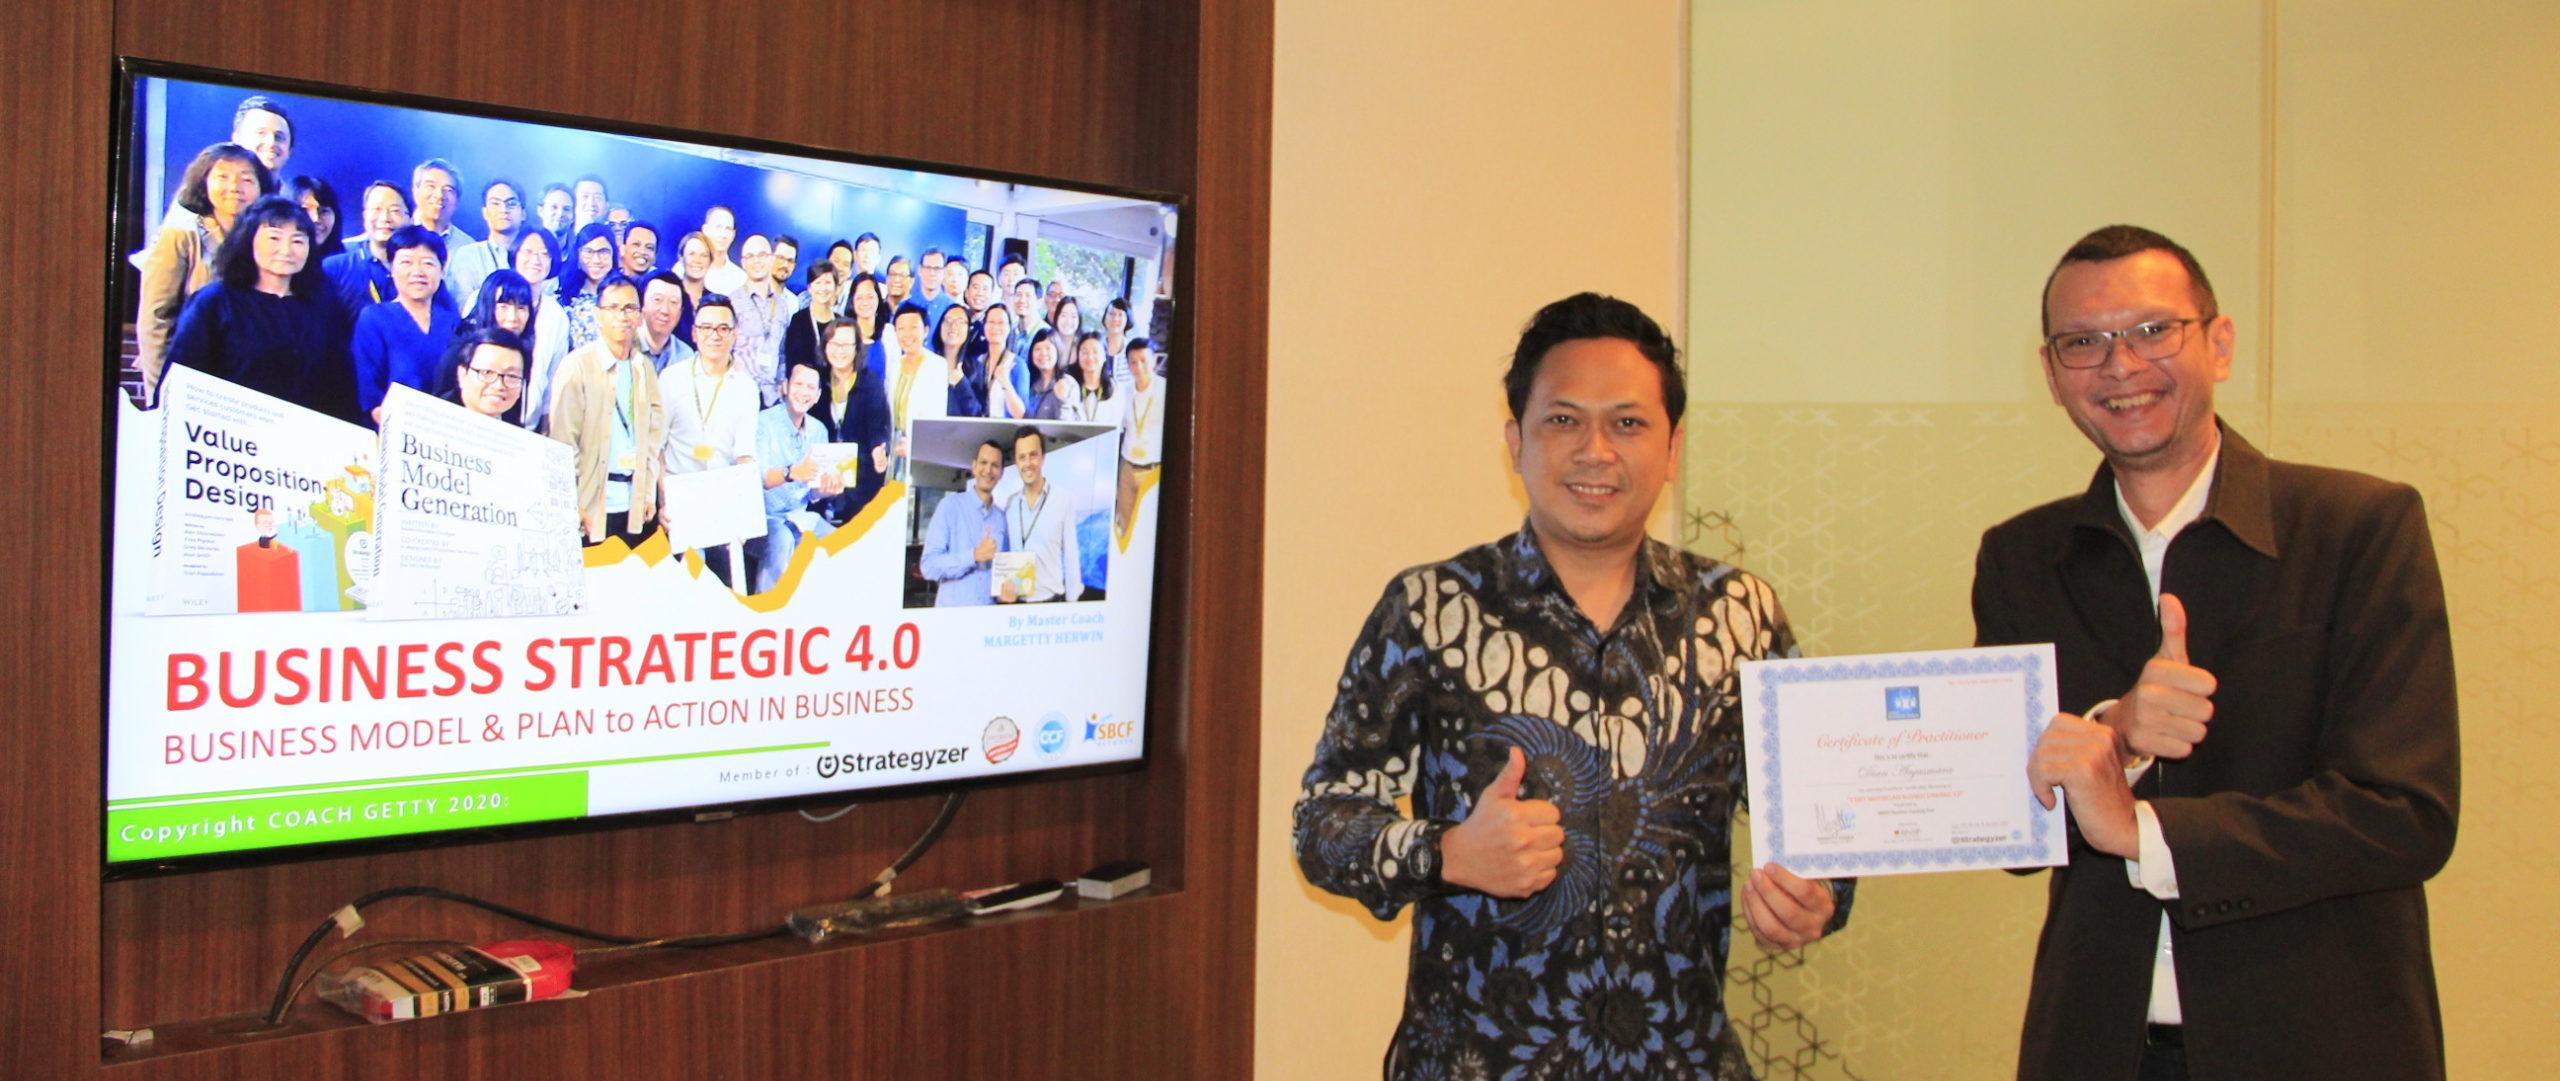 Masterclass Business Strategic 4.0 2020